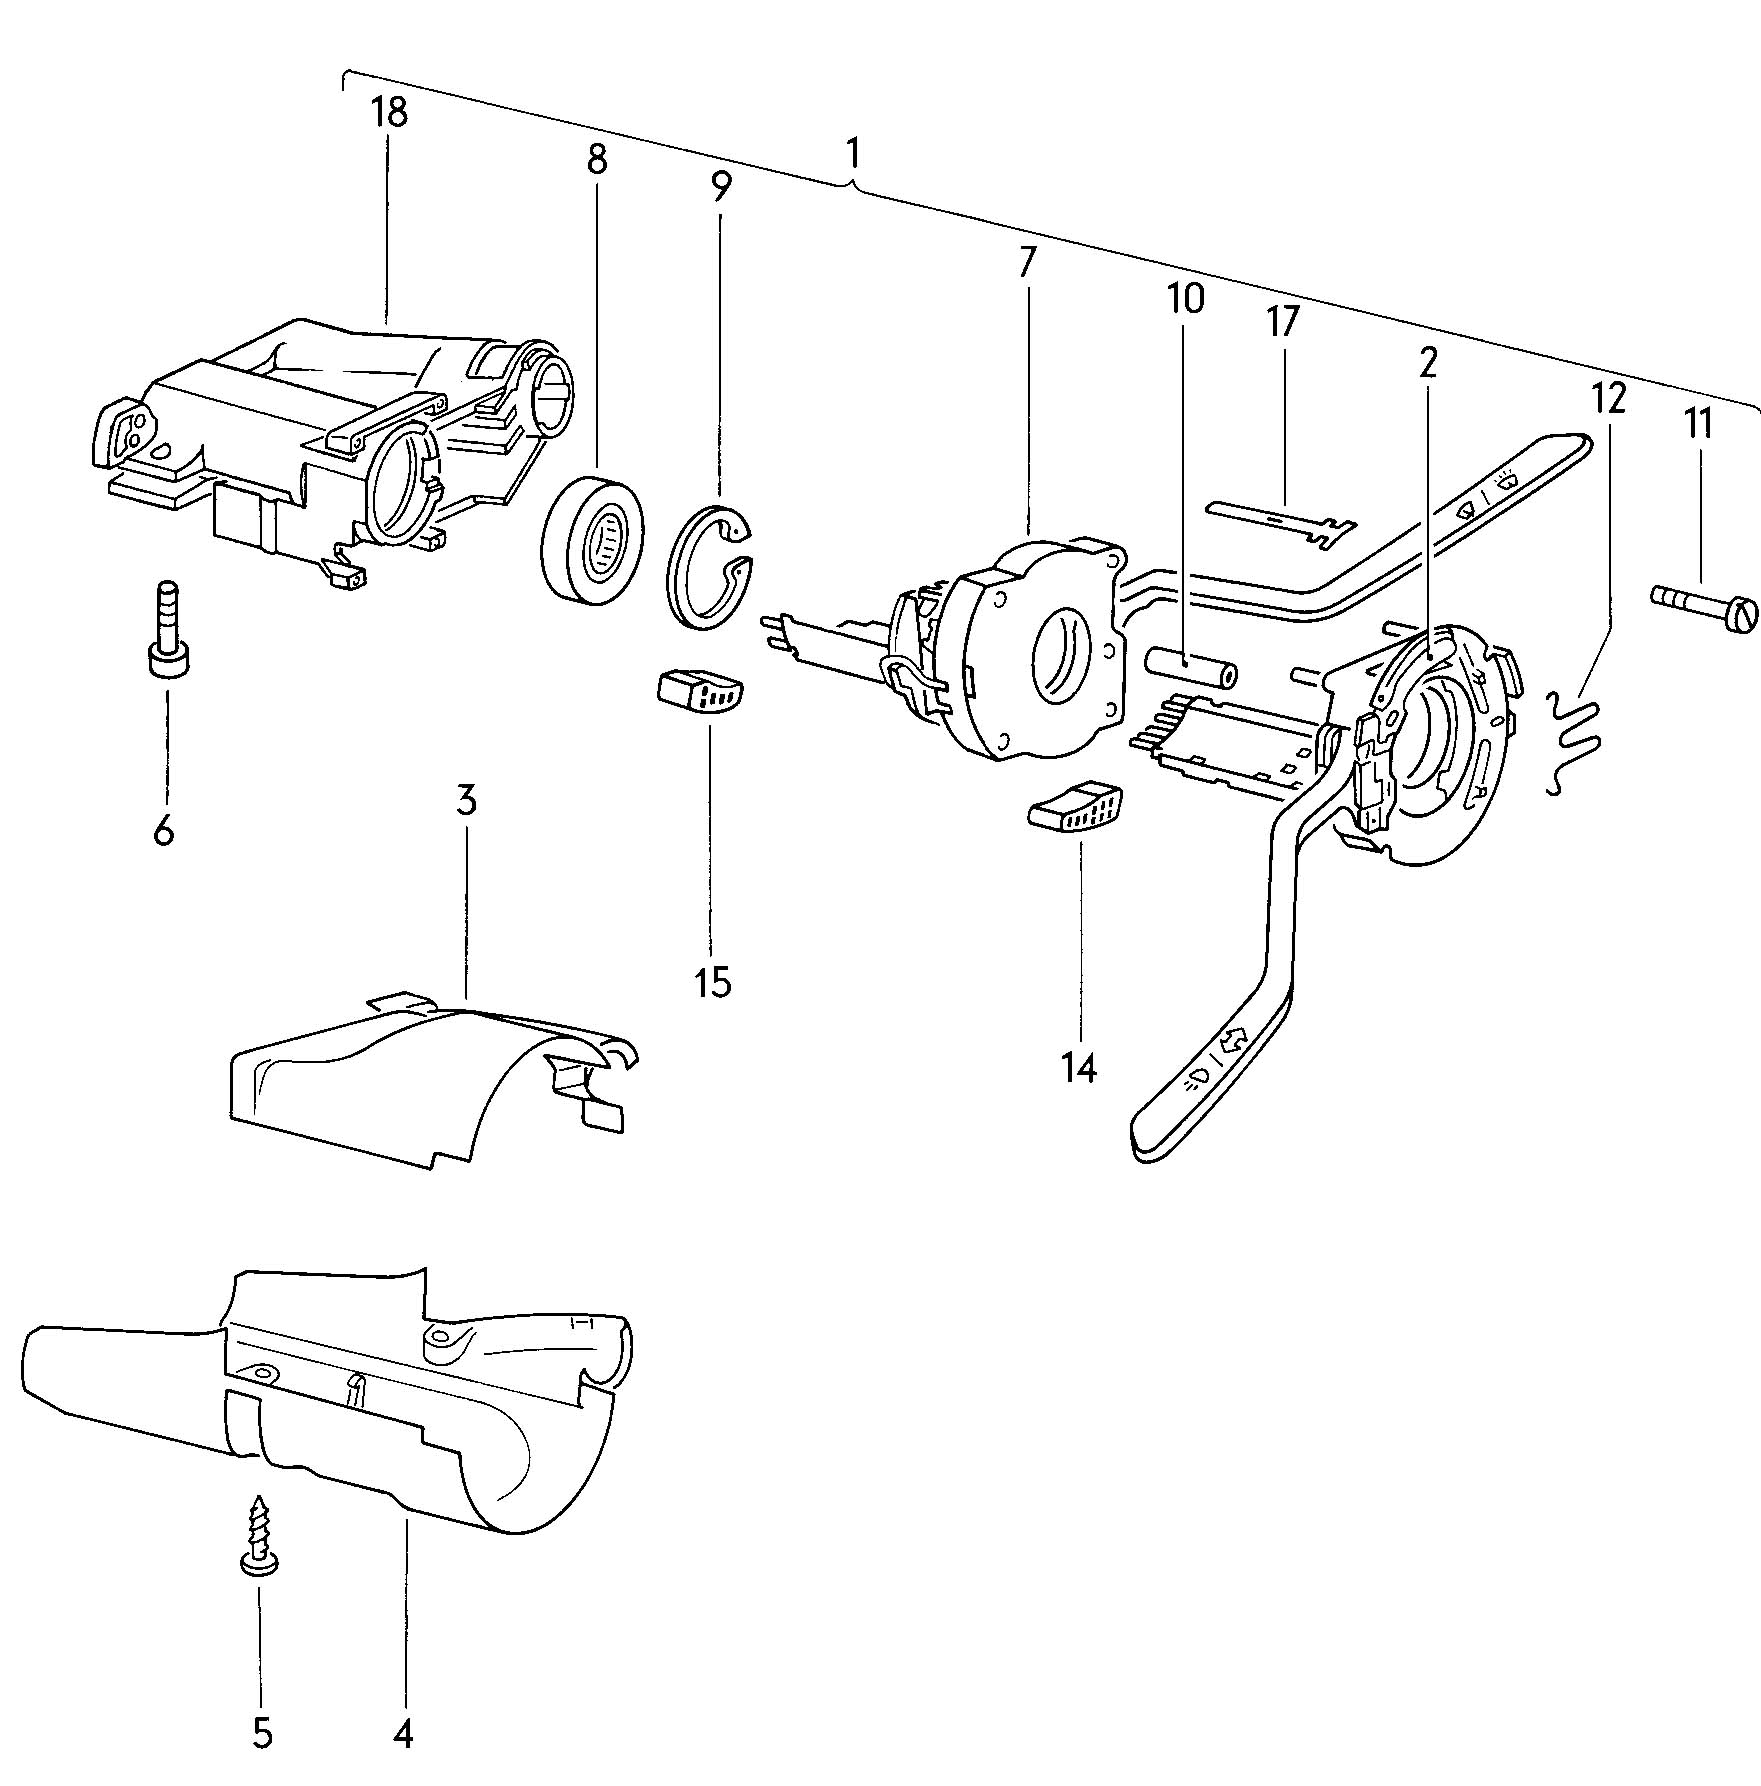 Volkswagen Scirocco Steering Lock Without Ignition Starter